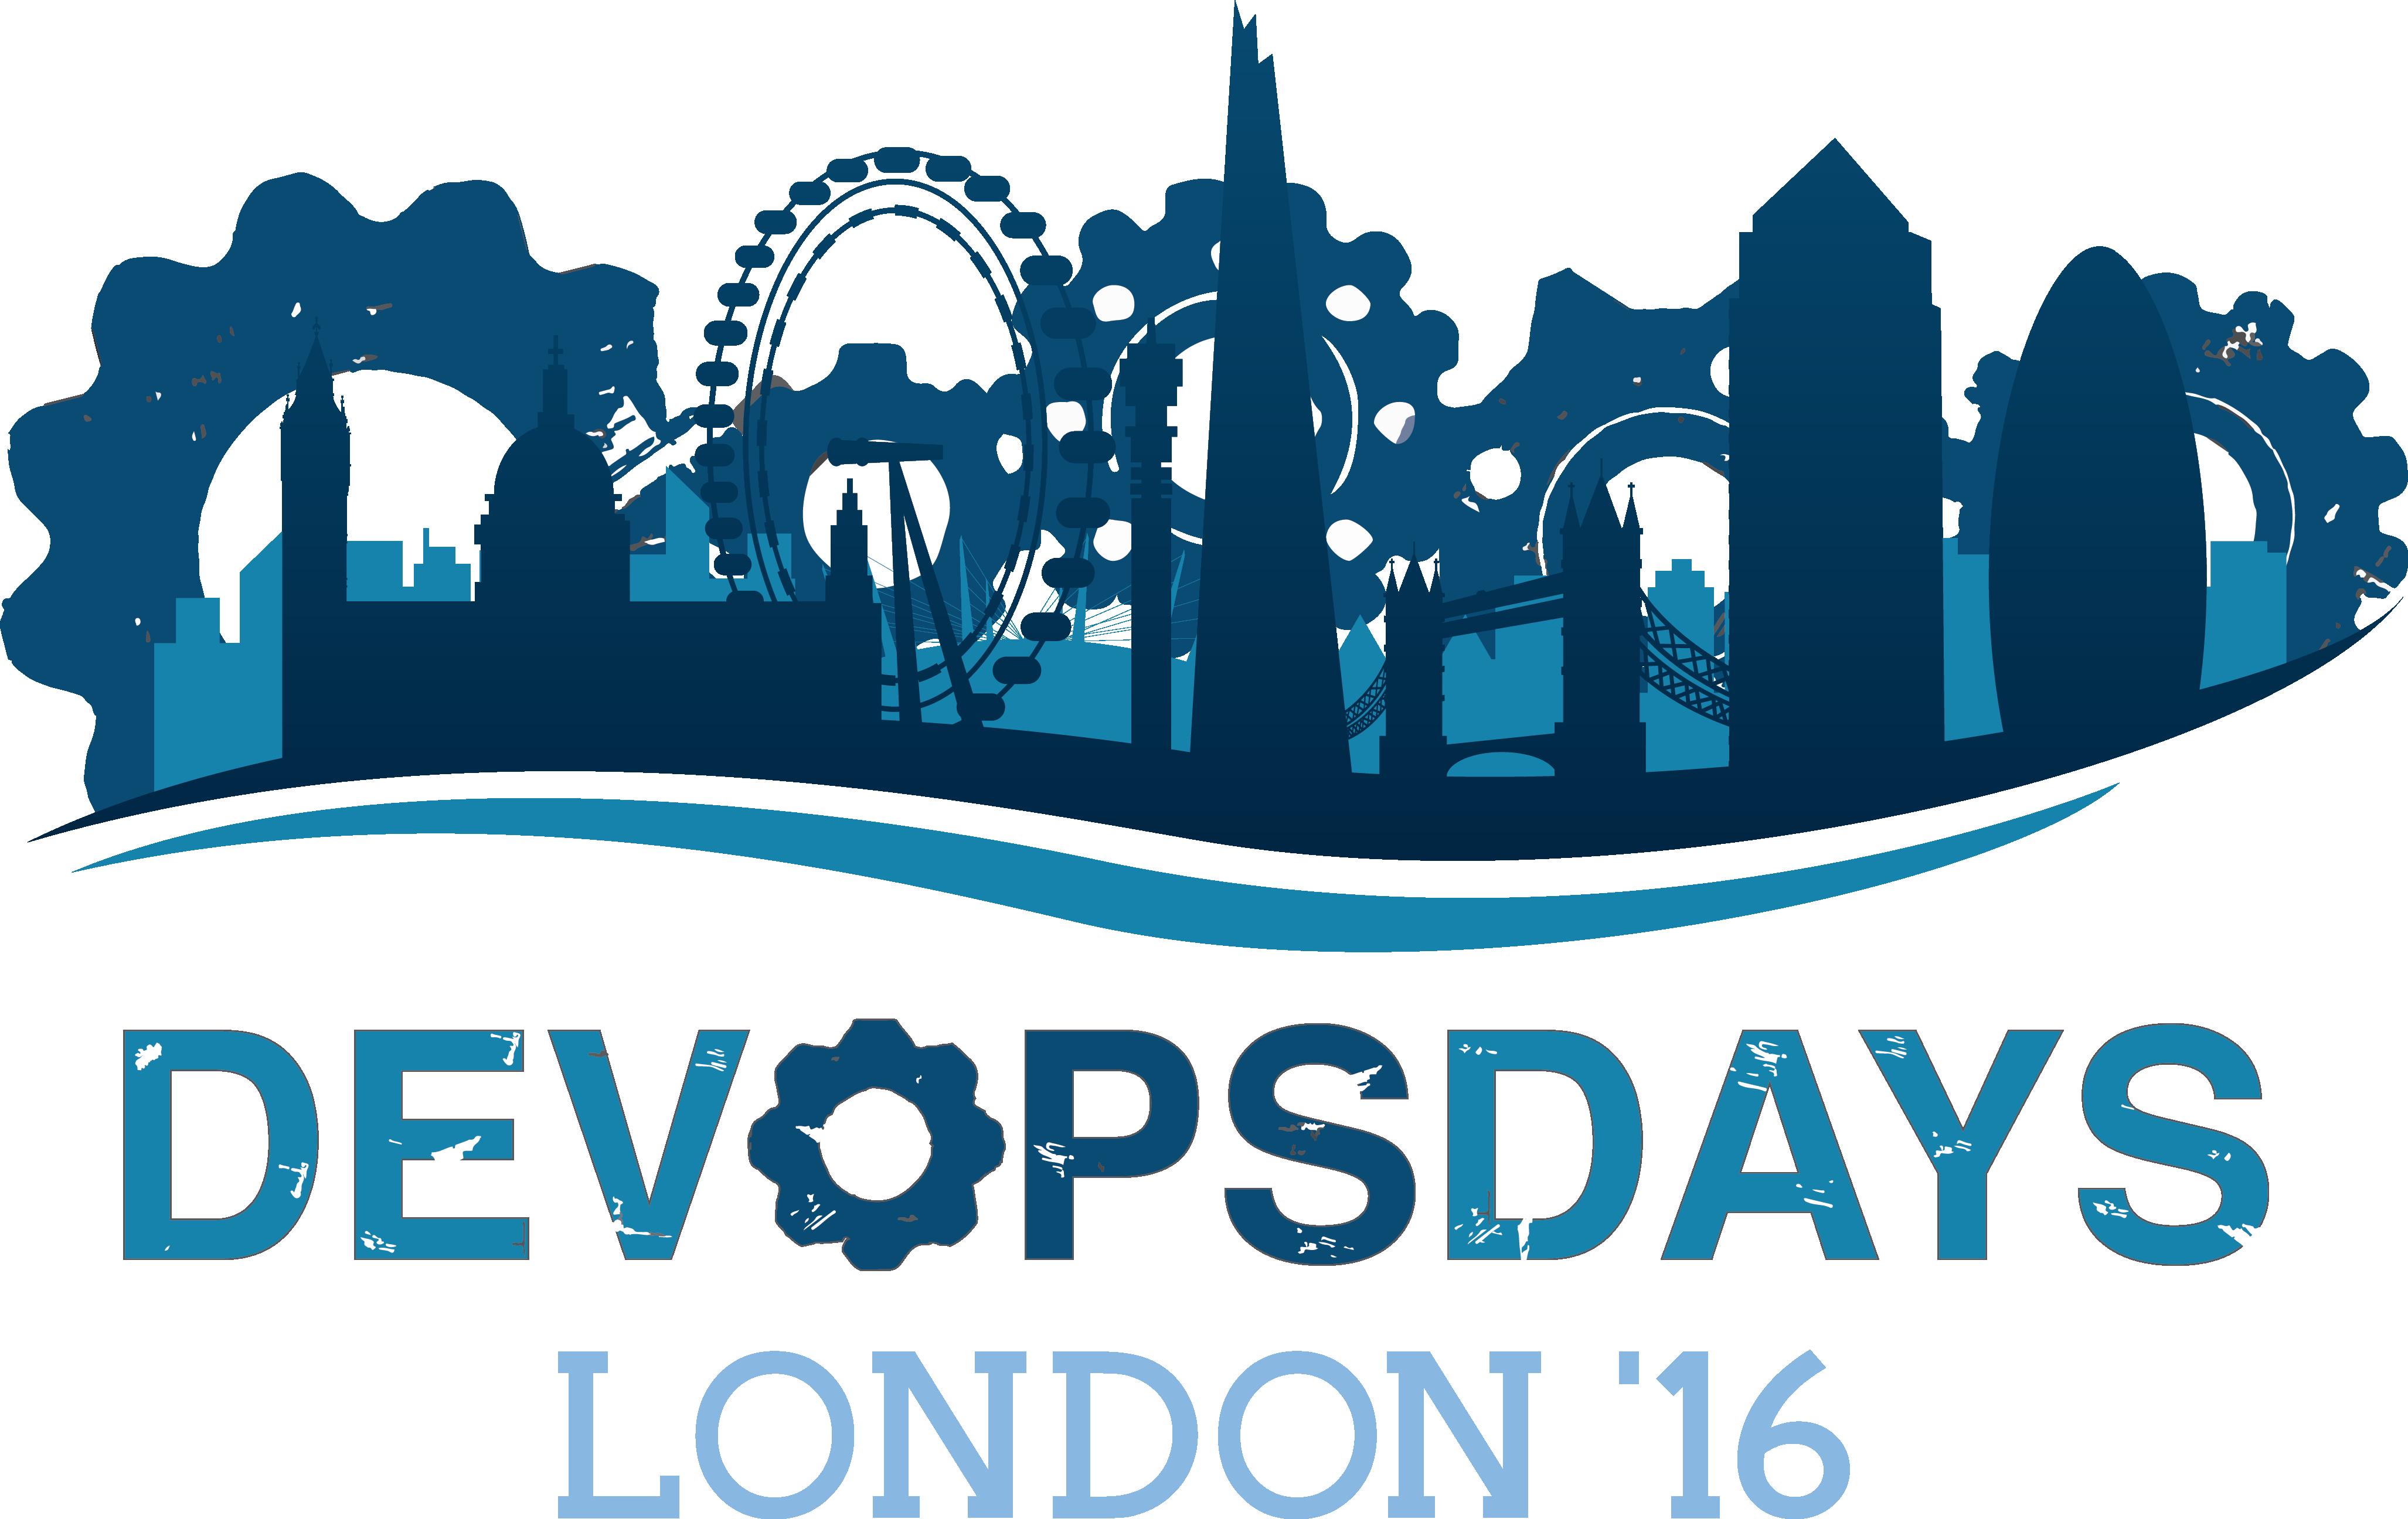 devopsdays London 2016